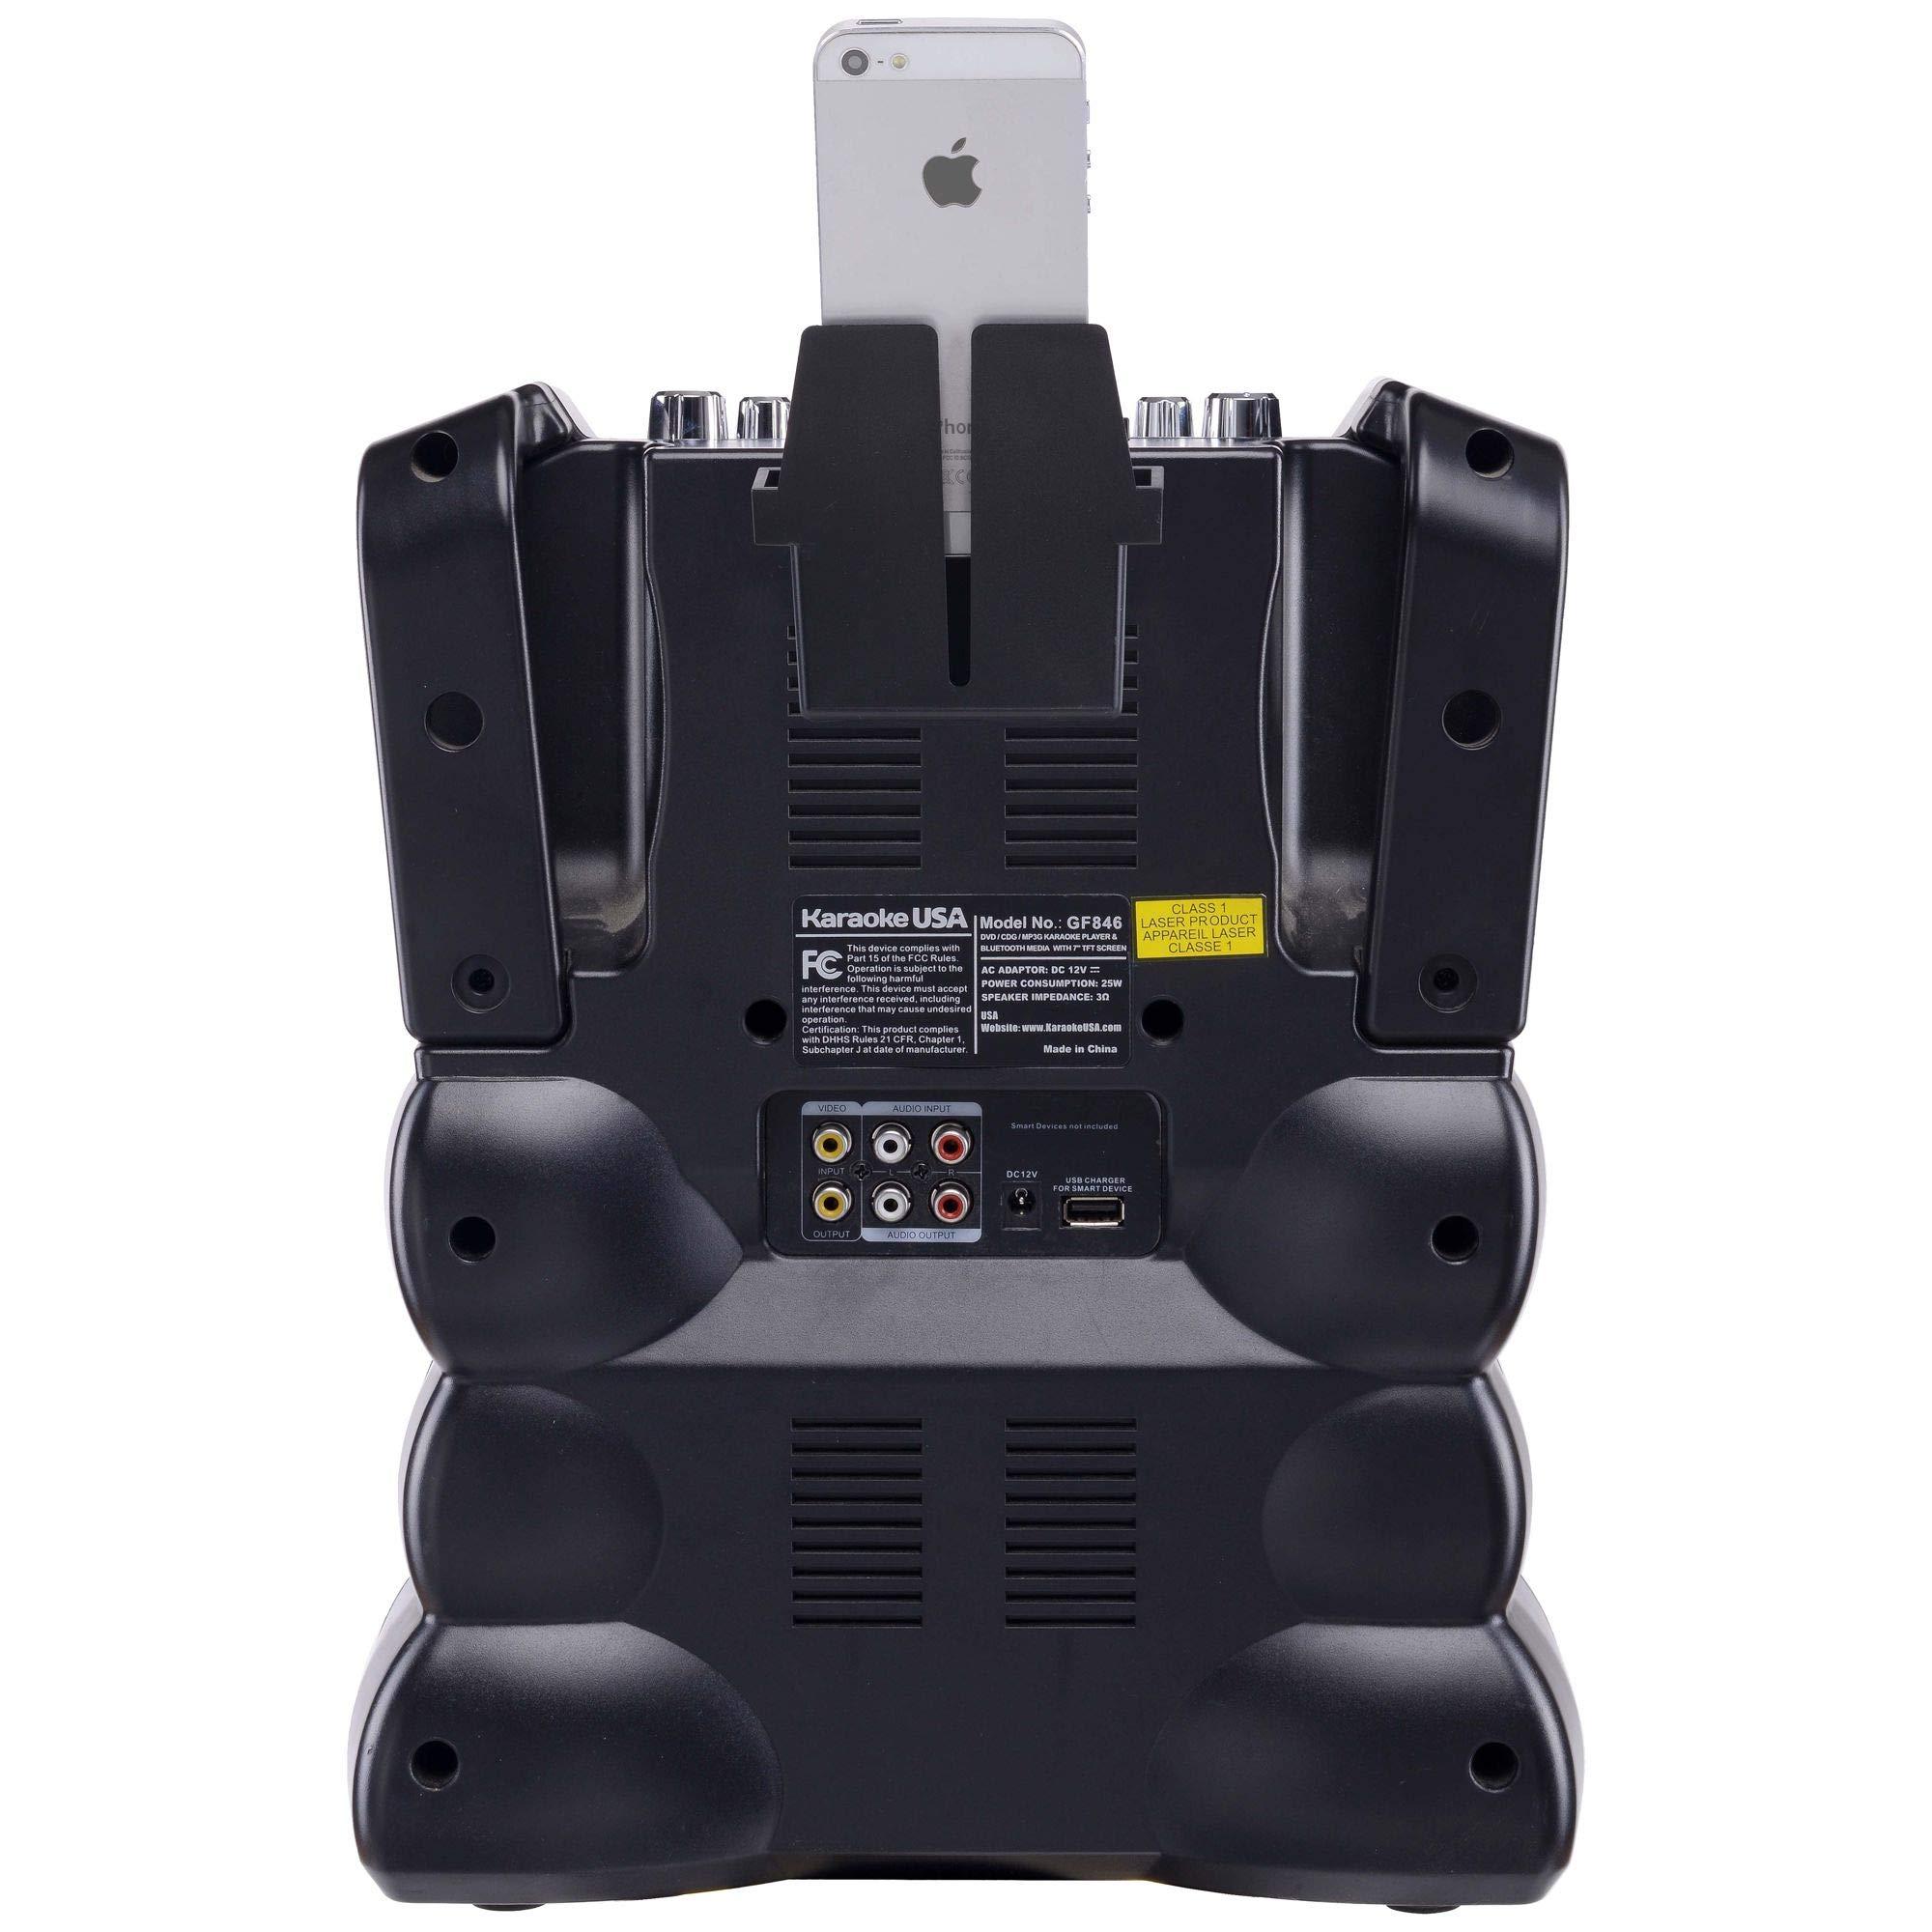 Karaoke USA GF846 DVD/CDG/MP3G Karaoke Machine with 7'' TFT Color Screen, Record, Bluetooth and LED Sync Lights by Karaoke USA (Image #6)